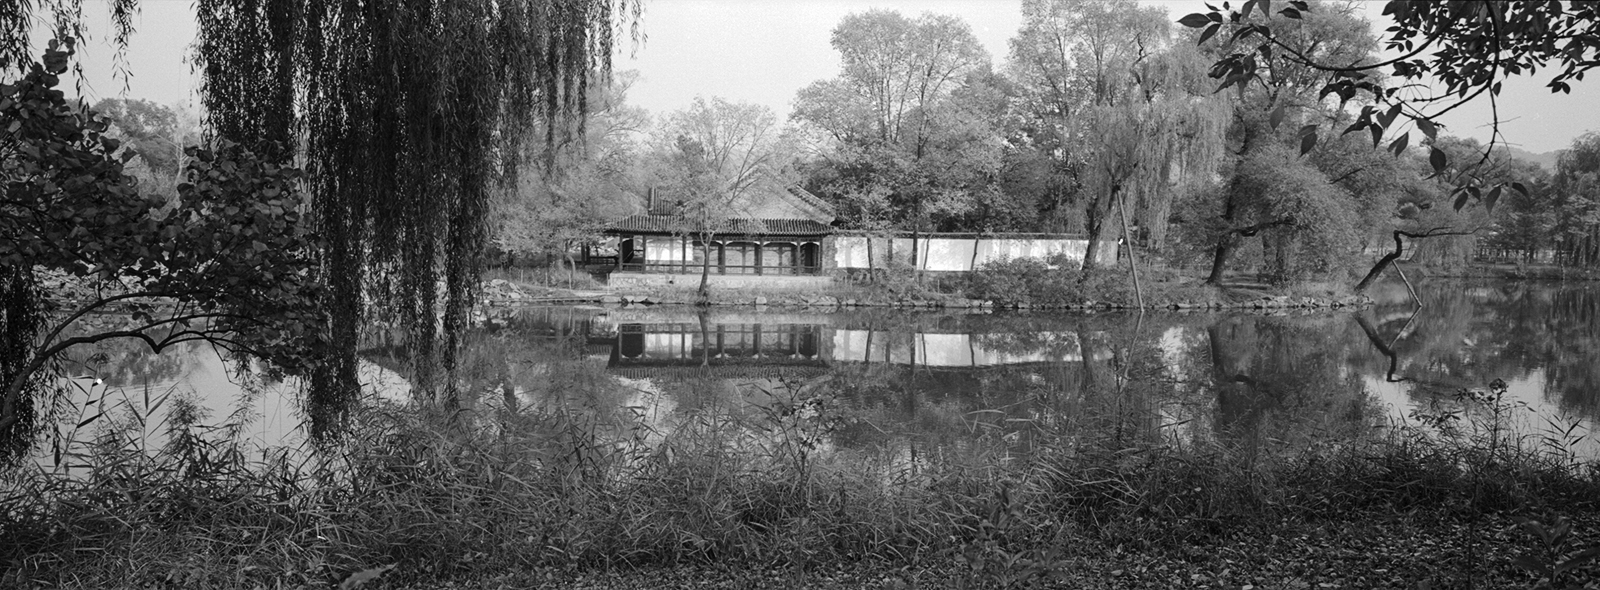 Vnukov Pavel. Китай. Без названия